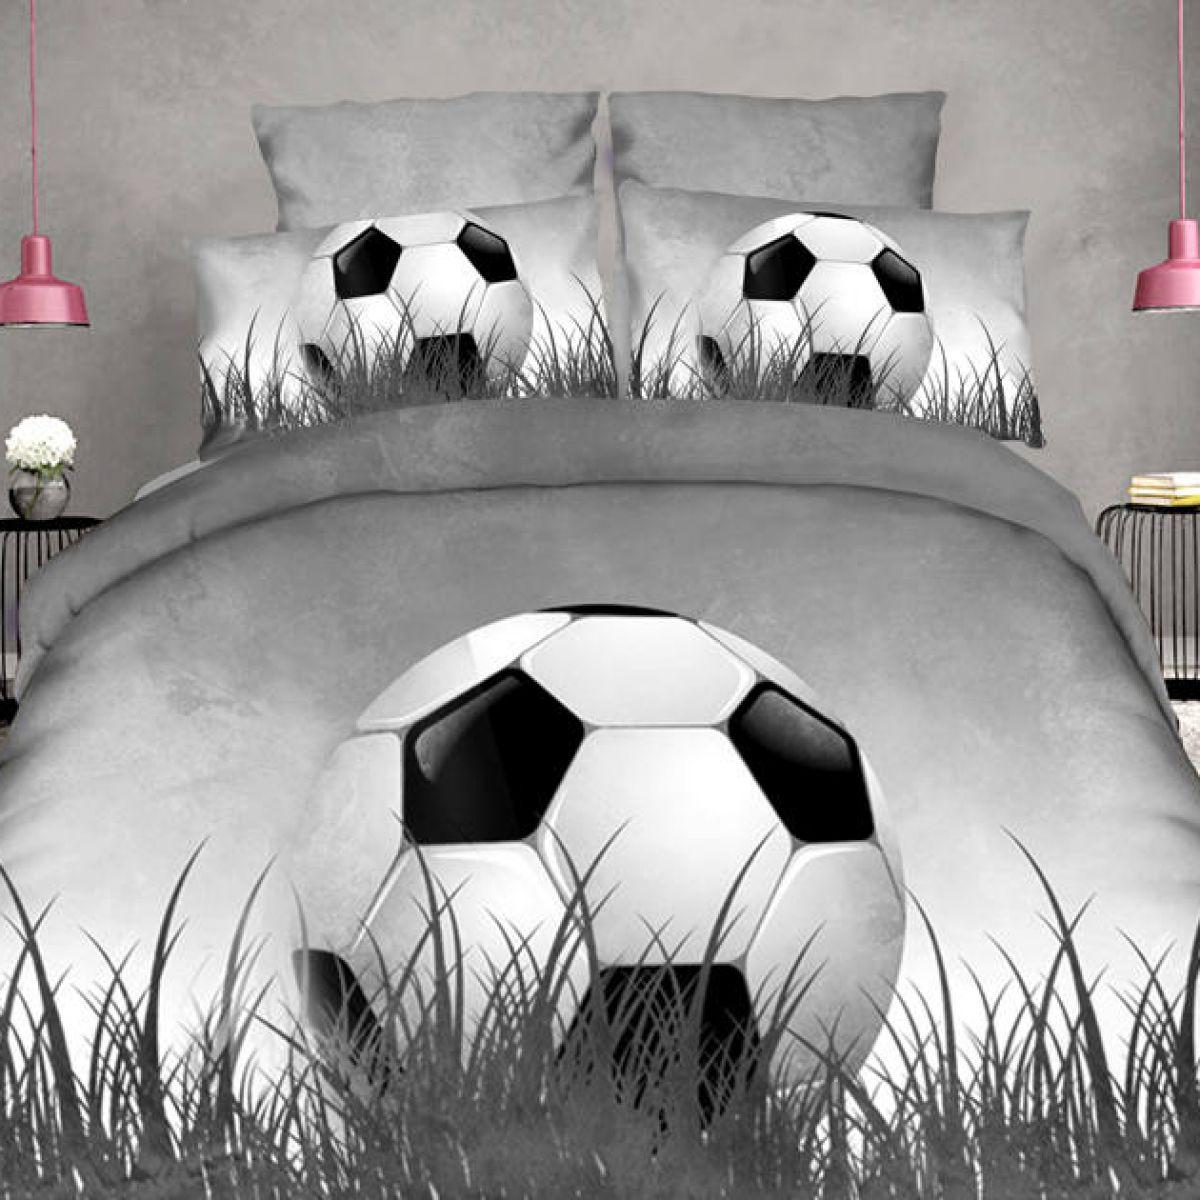 3D Beddings - Antonio - AML-26 - 160x200 cm - 4 pcs